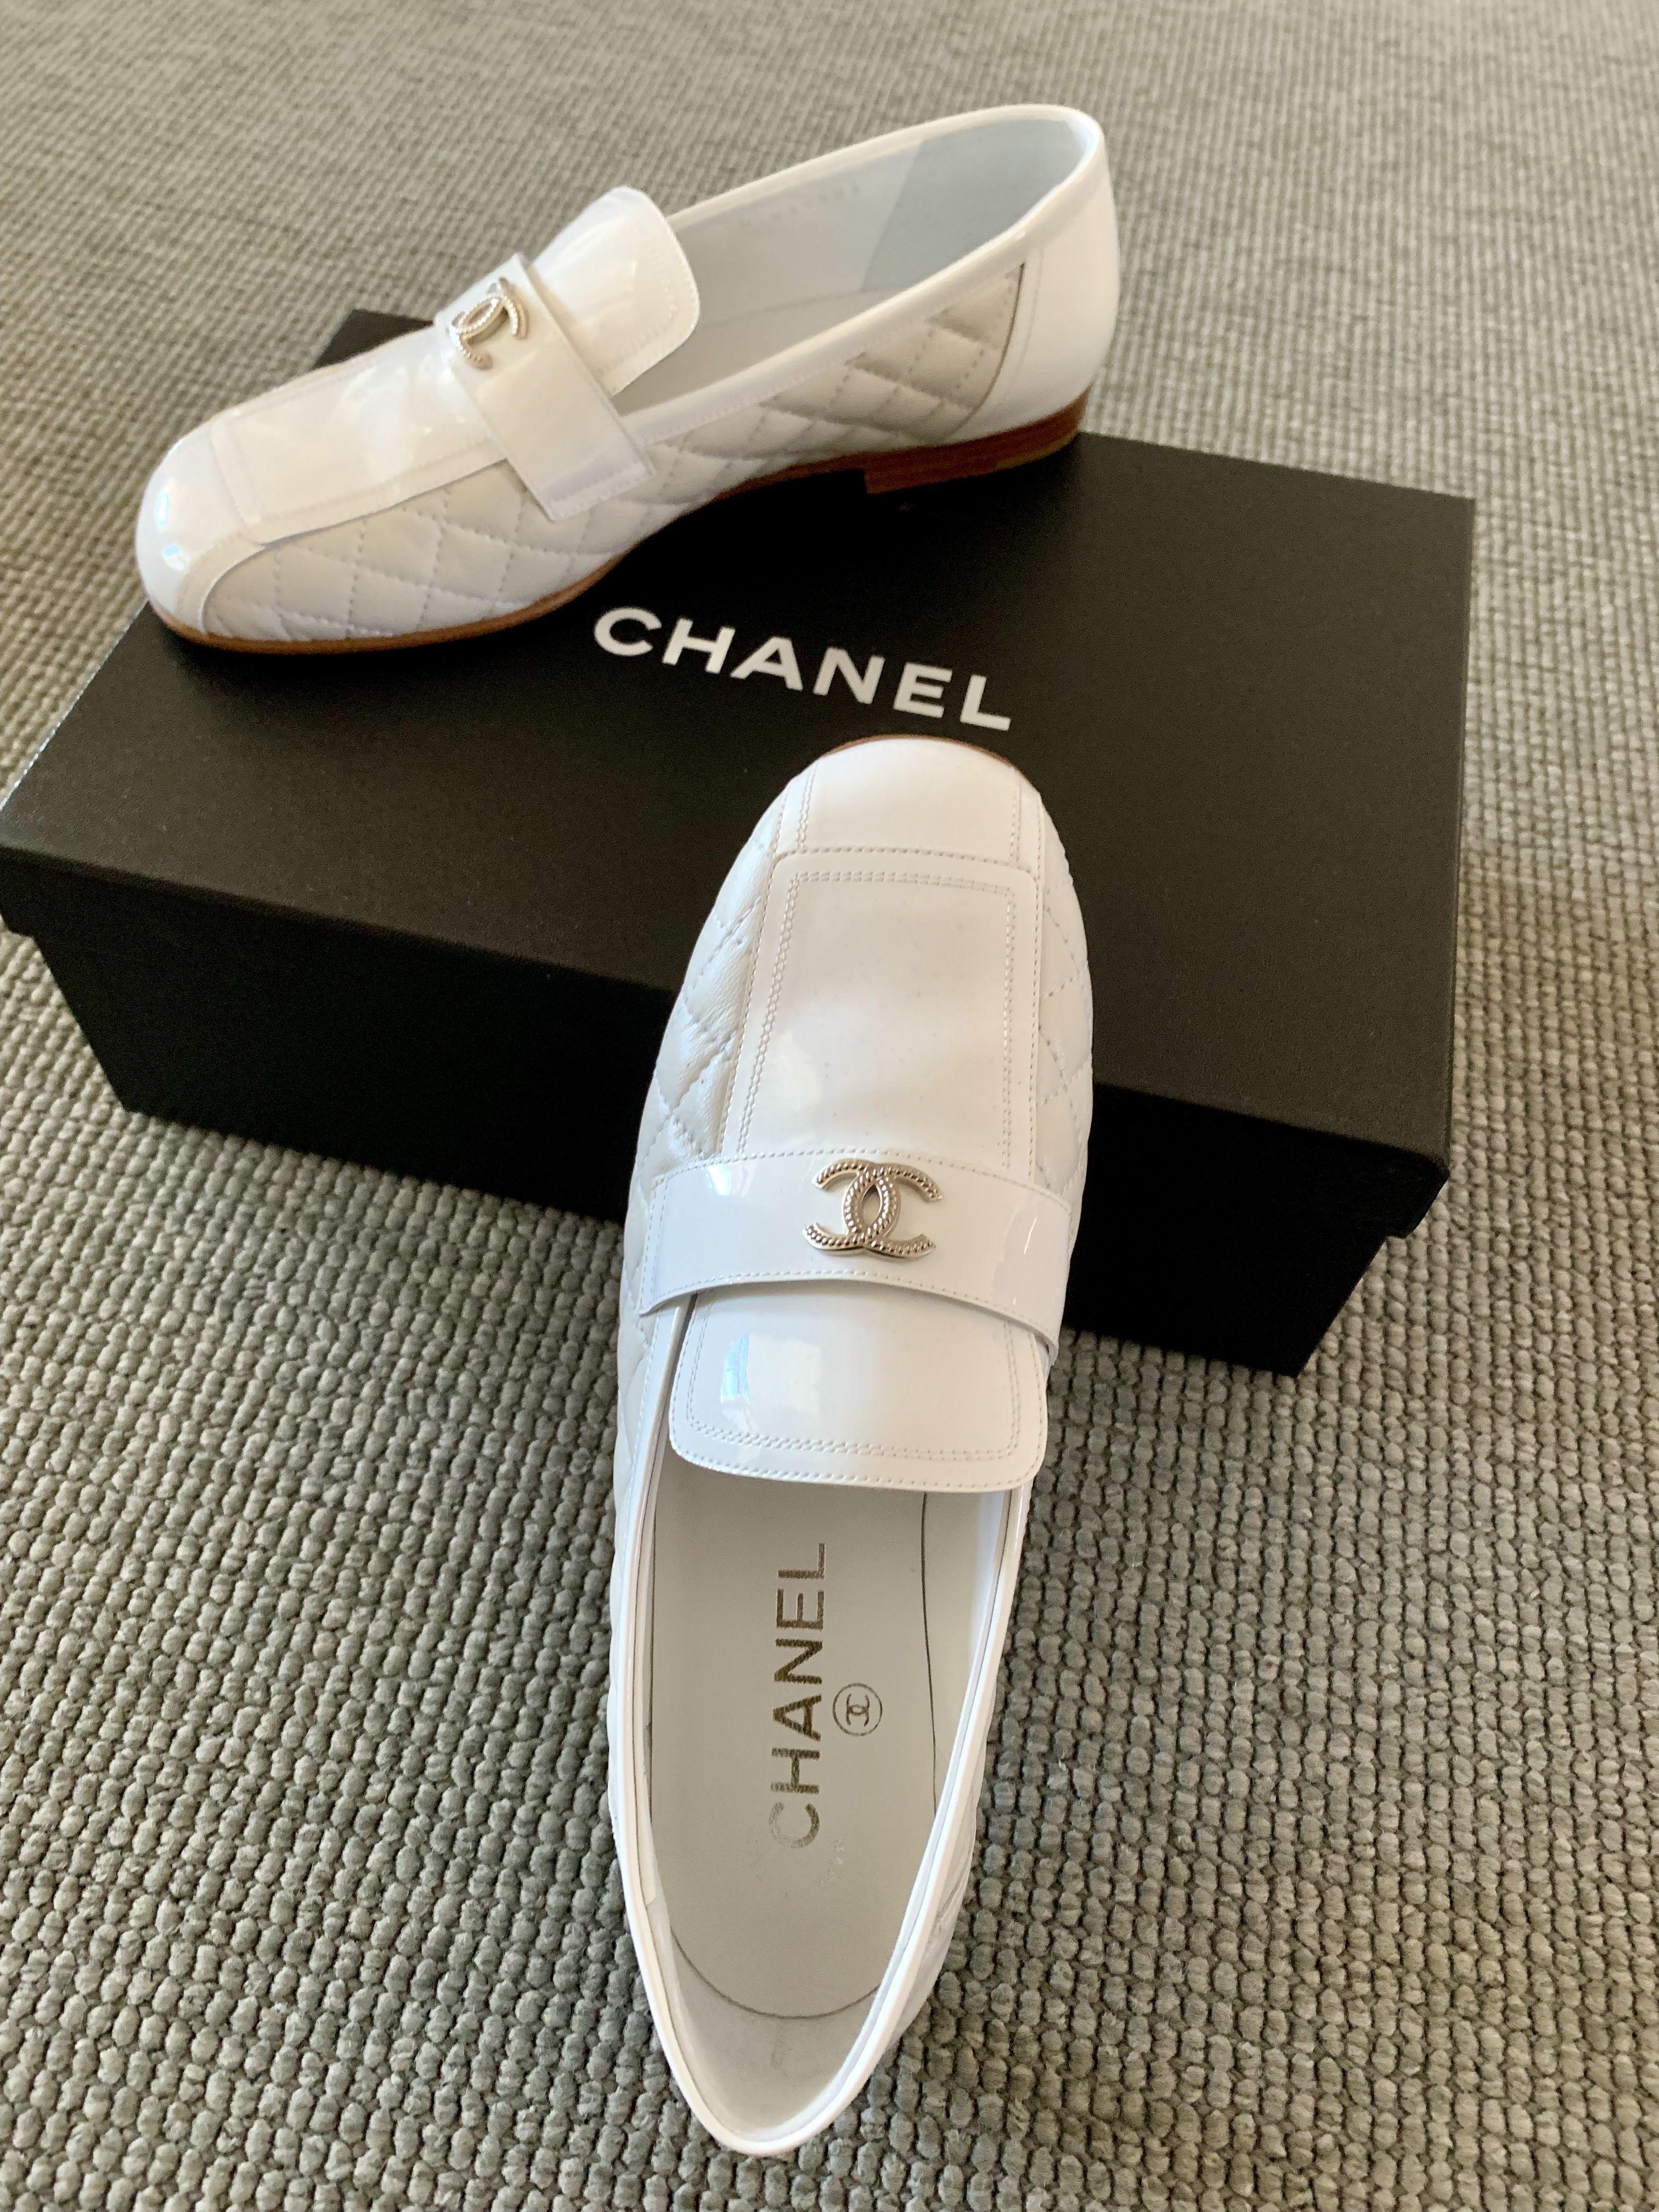 Chanel white loafer | Dress shoes men